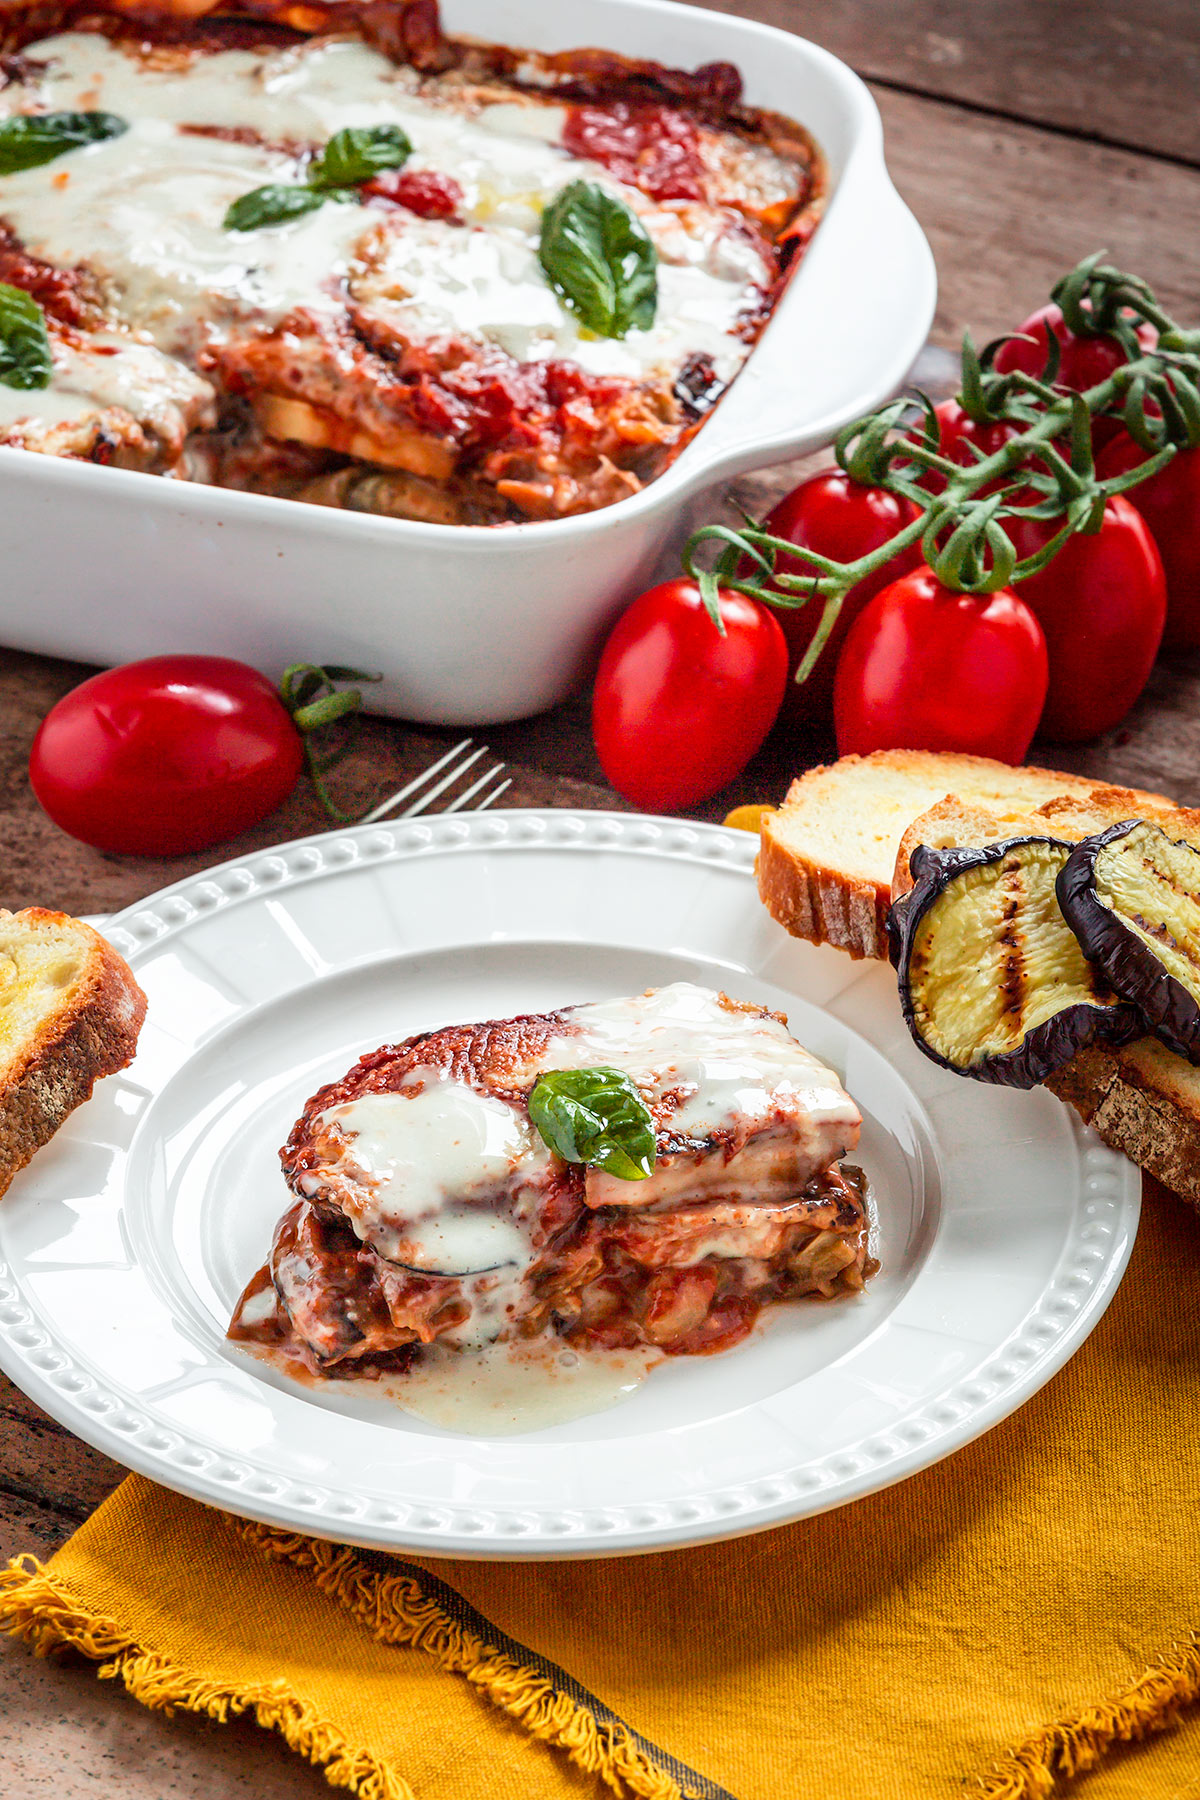 Italian Vegan EGGPLANT PARMESAN with homemade vegan mozzarella MELANZANE alla PARMIGIANA VEGAN LIGHT al FORNO con mozzarella vegan fatta in casa e parmigiano vegan